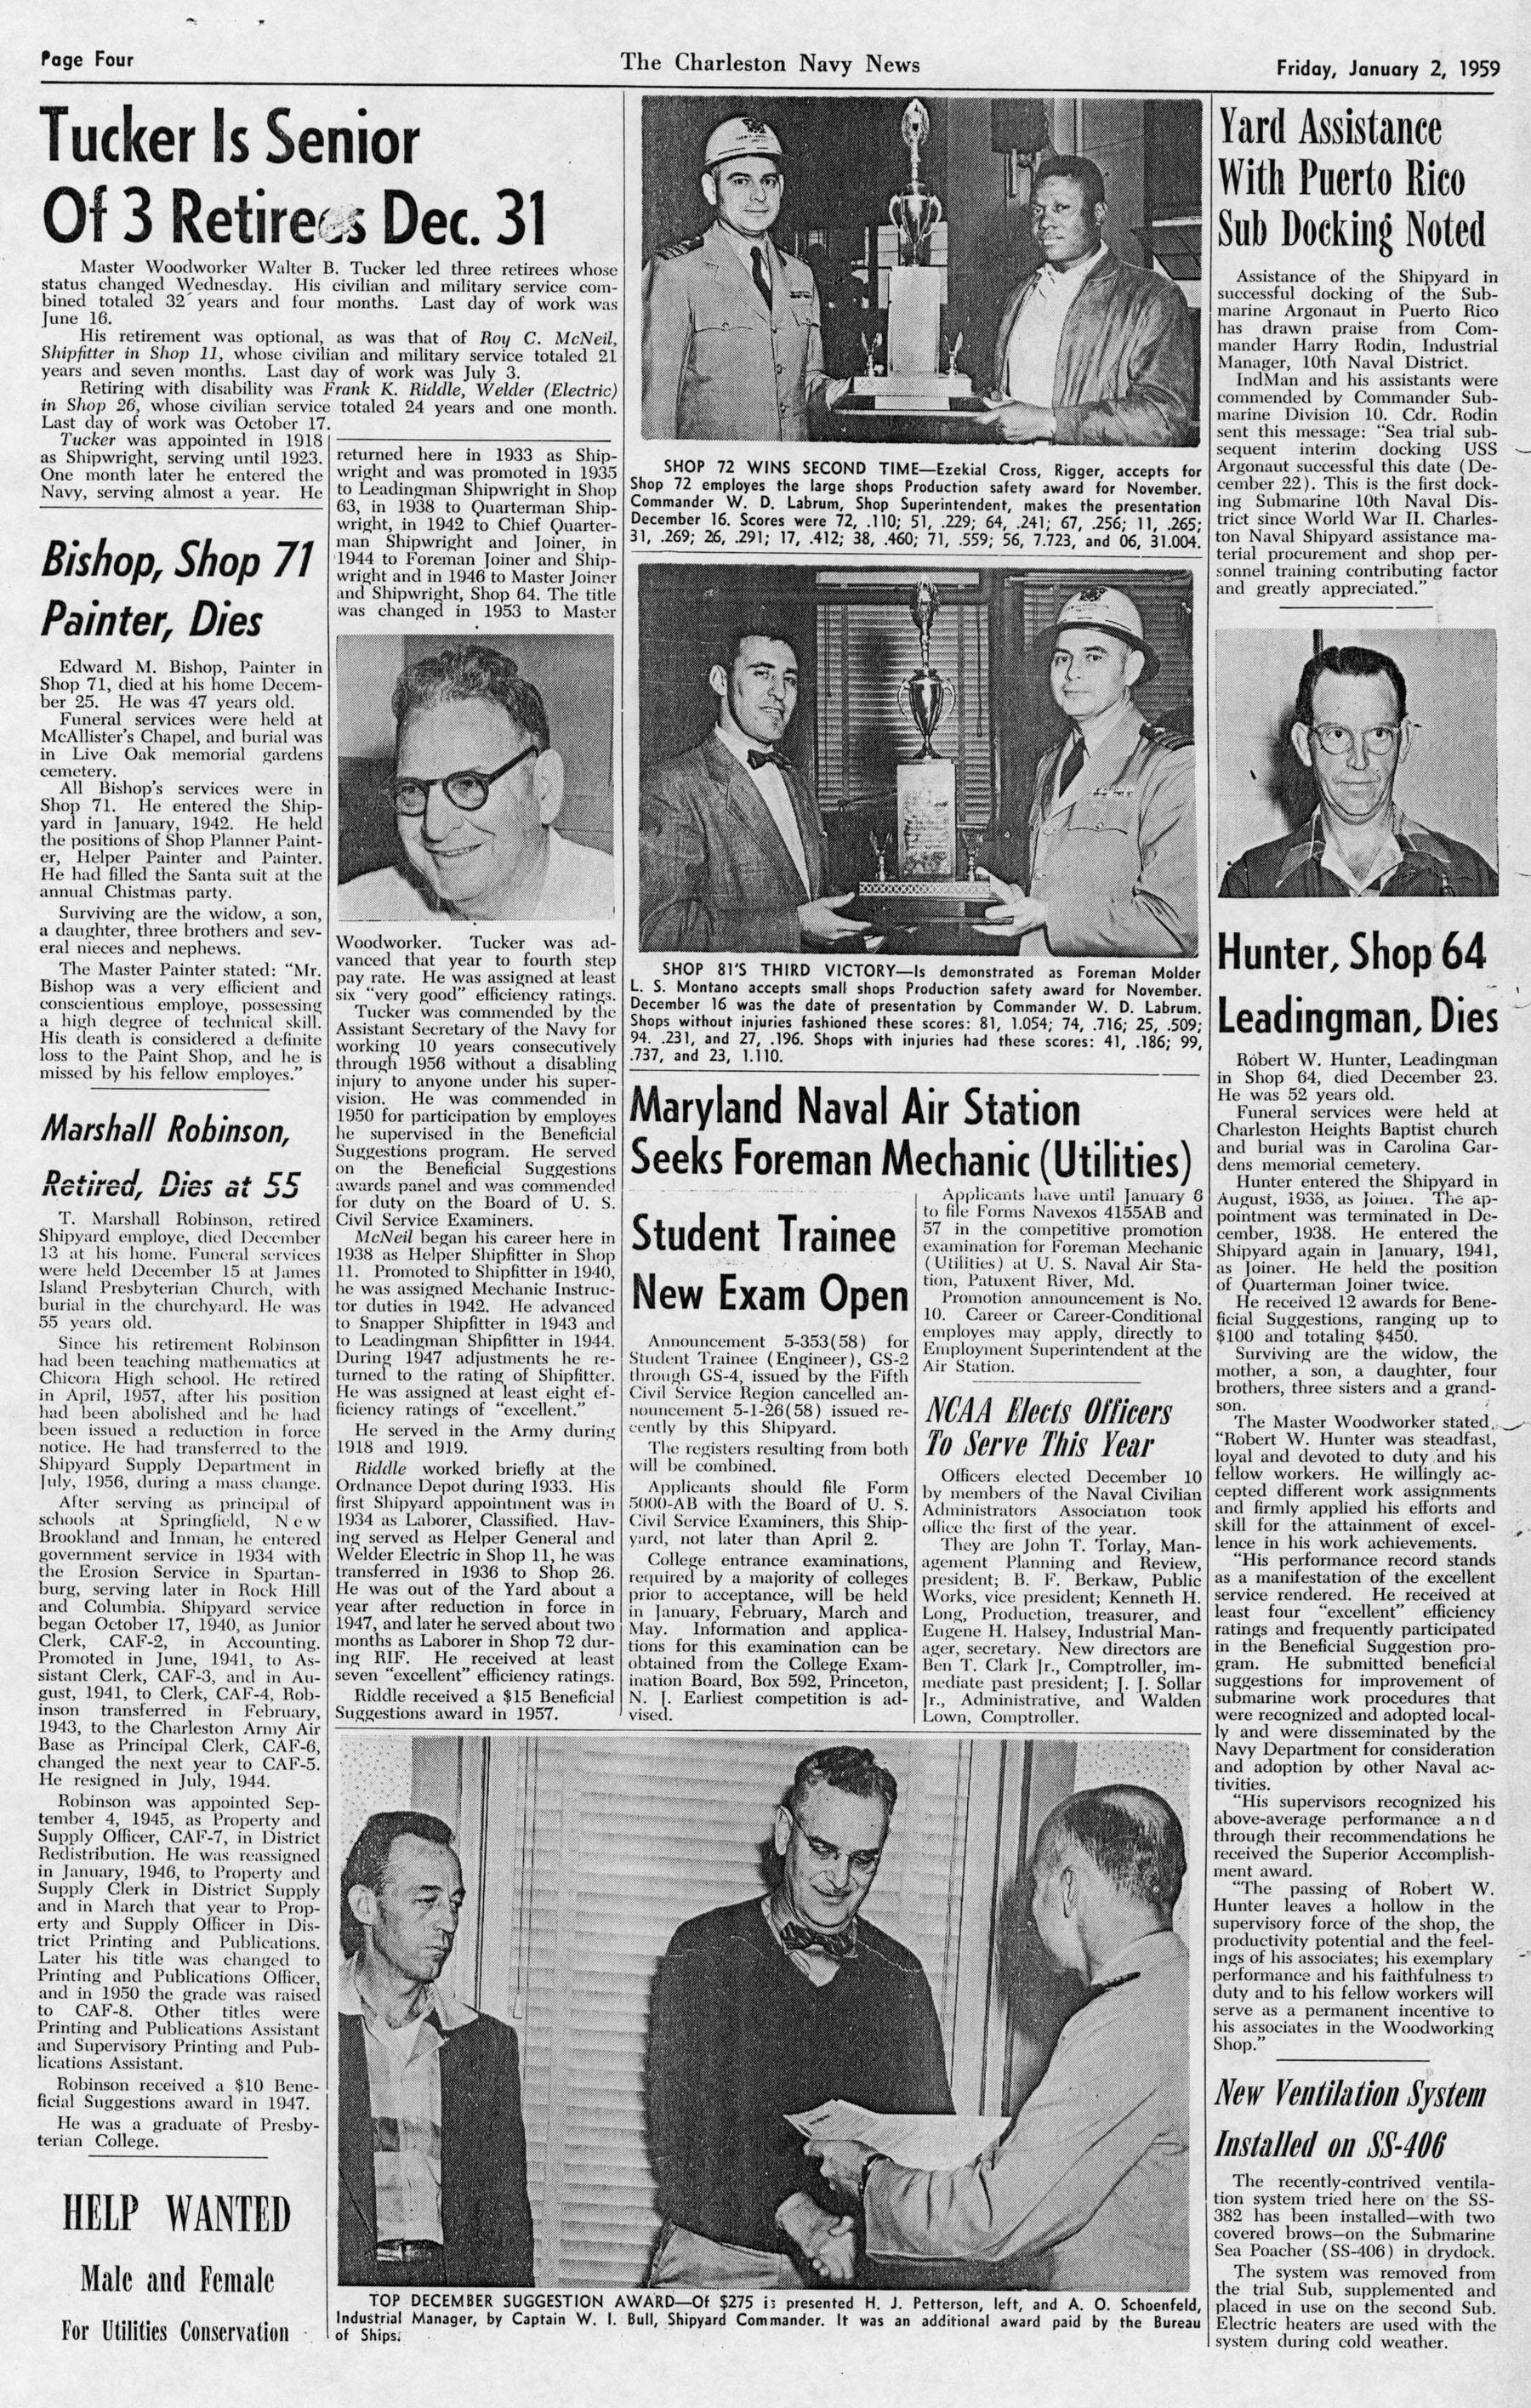 The Charleston Navy News, Volume 17, Edition 13, page iv